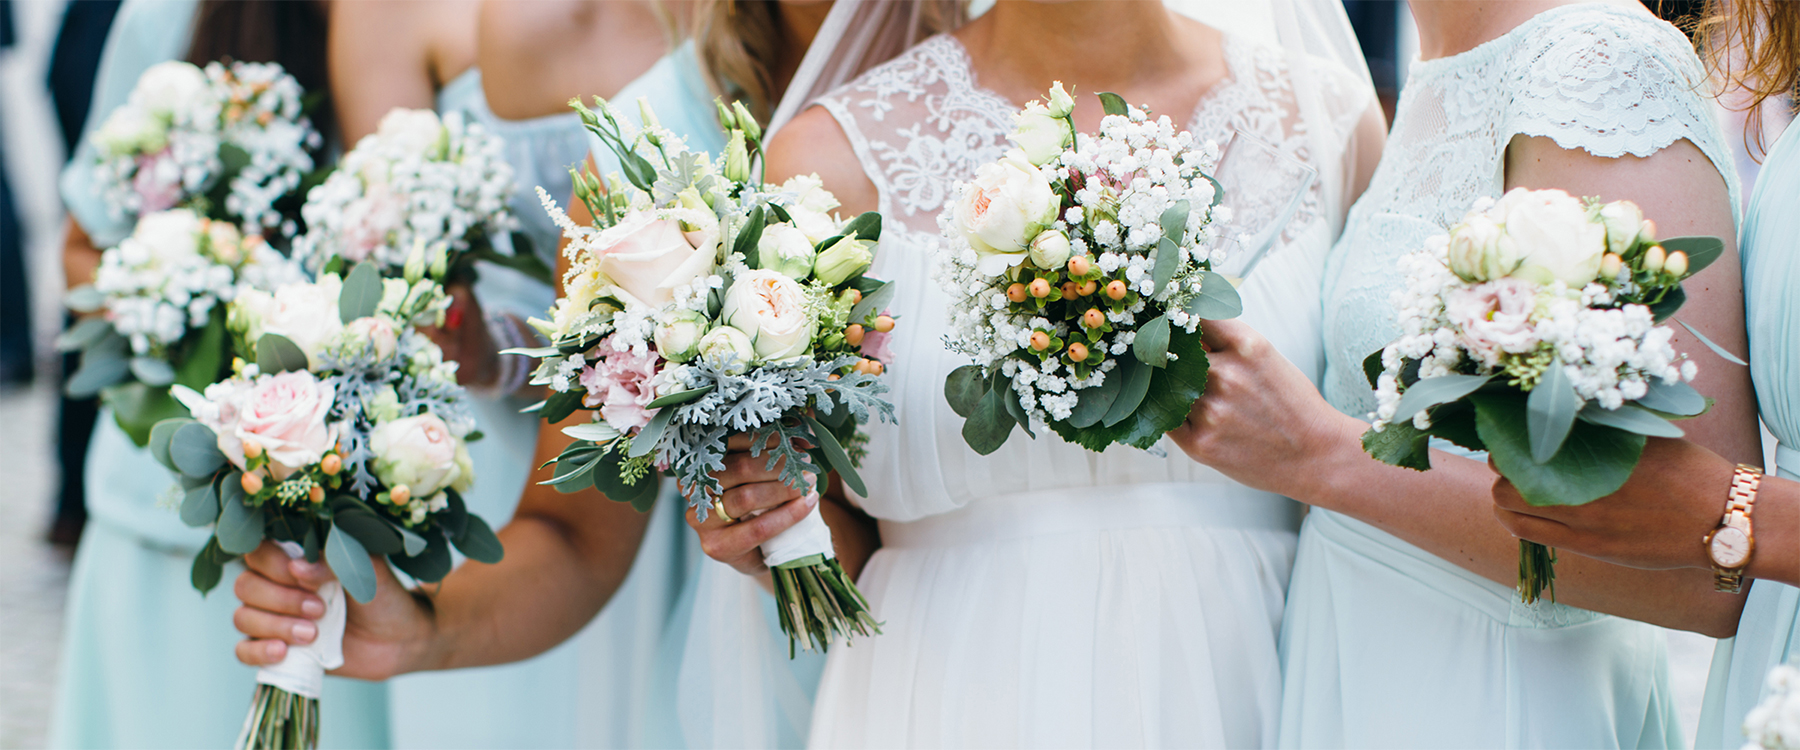 wedding-fotos-cinema-alenaalex-145.jpg